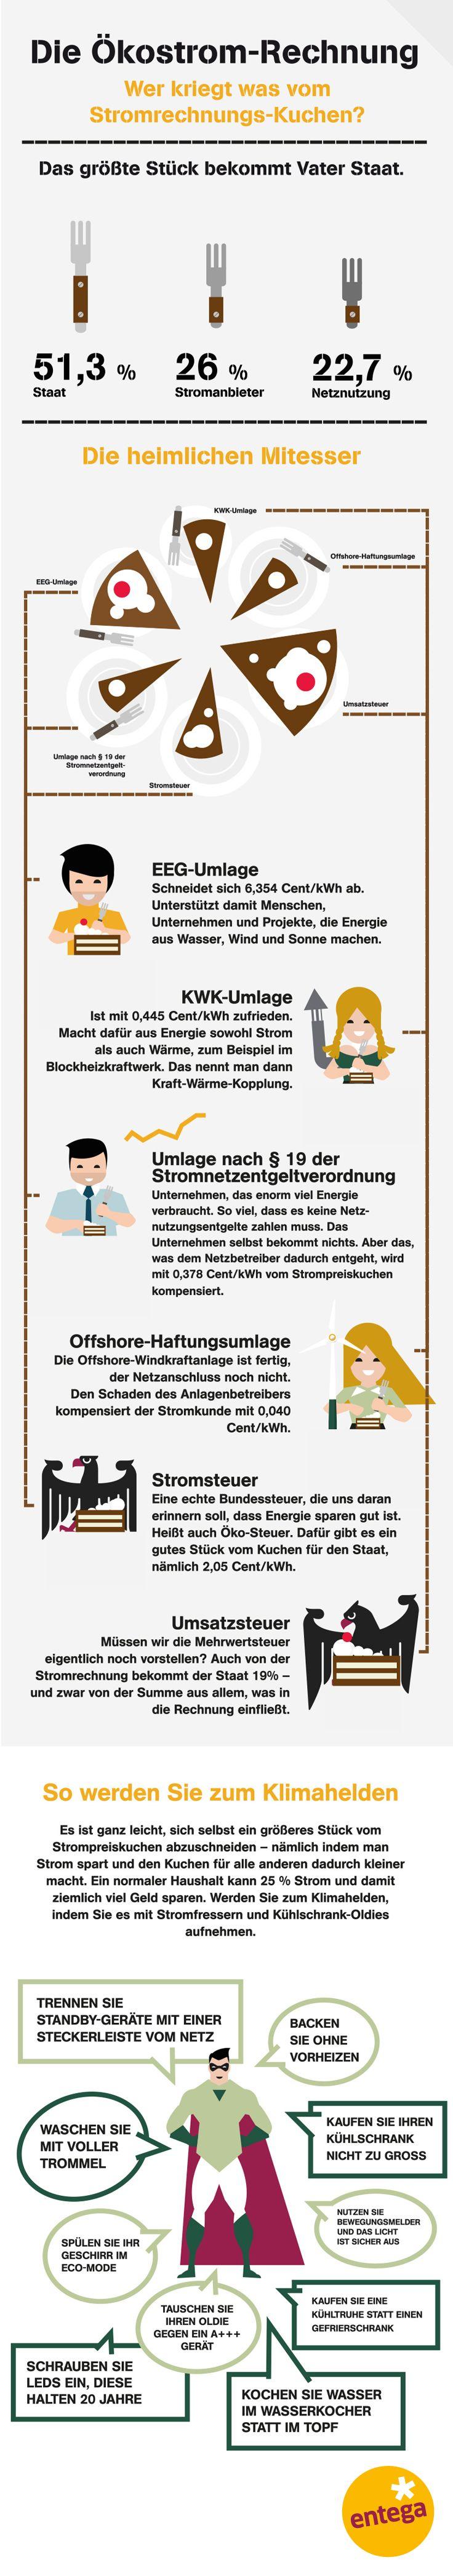 7 best infografik kostrom images on pinterest germany info graphics and households. Black Bedroom Furniture Sets. Home Design Ideas